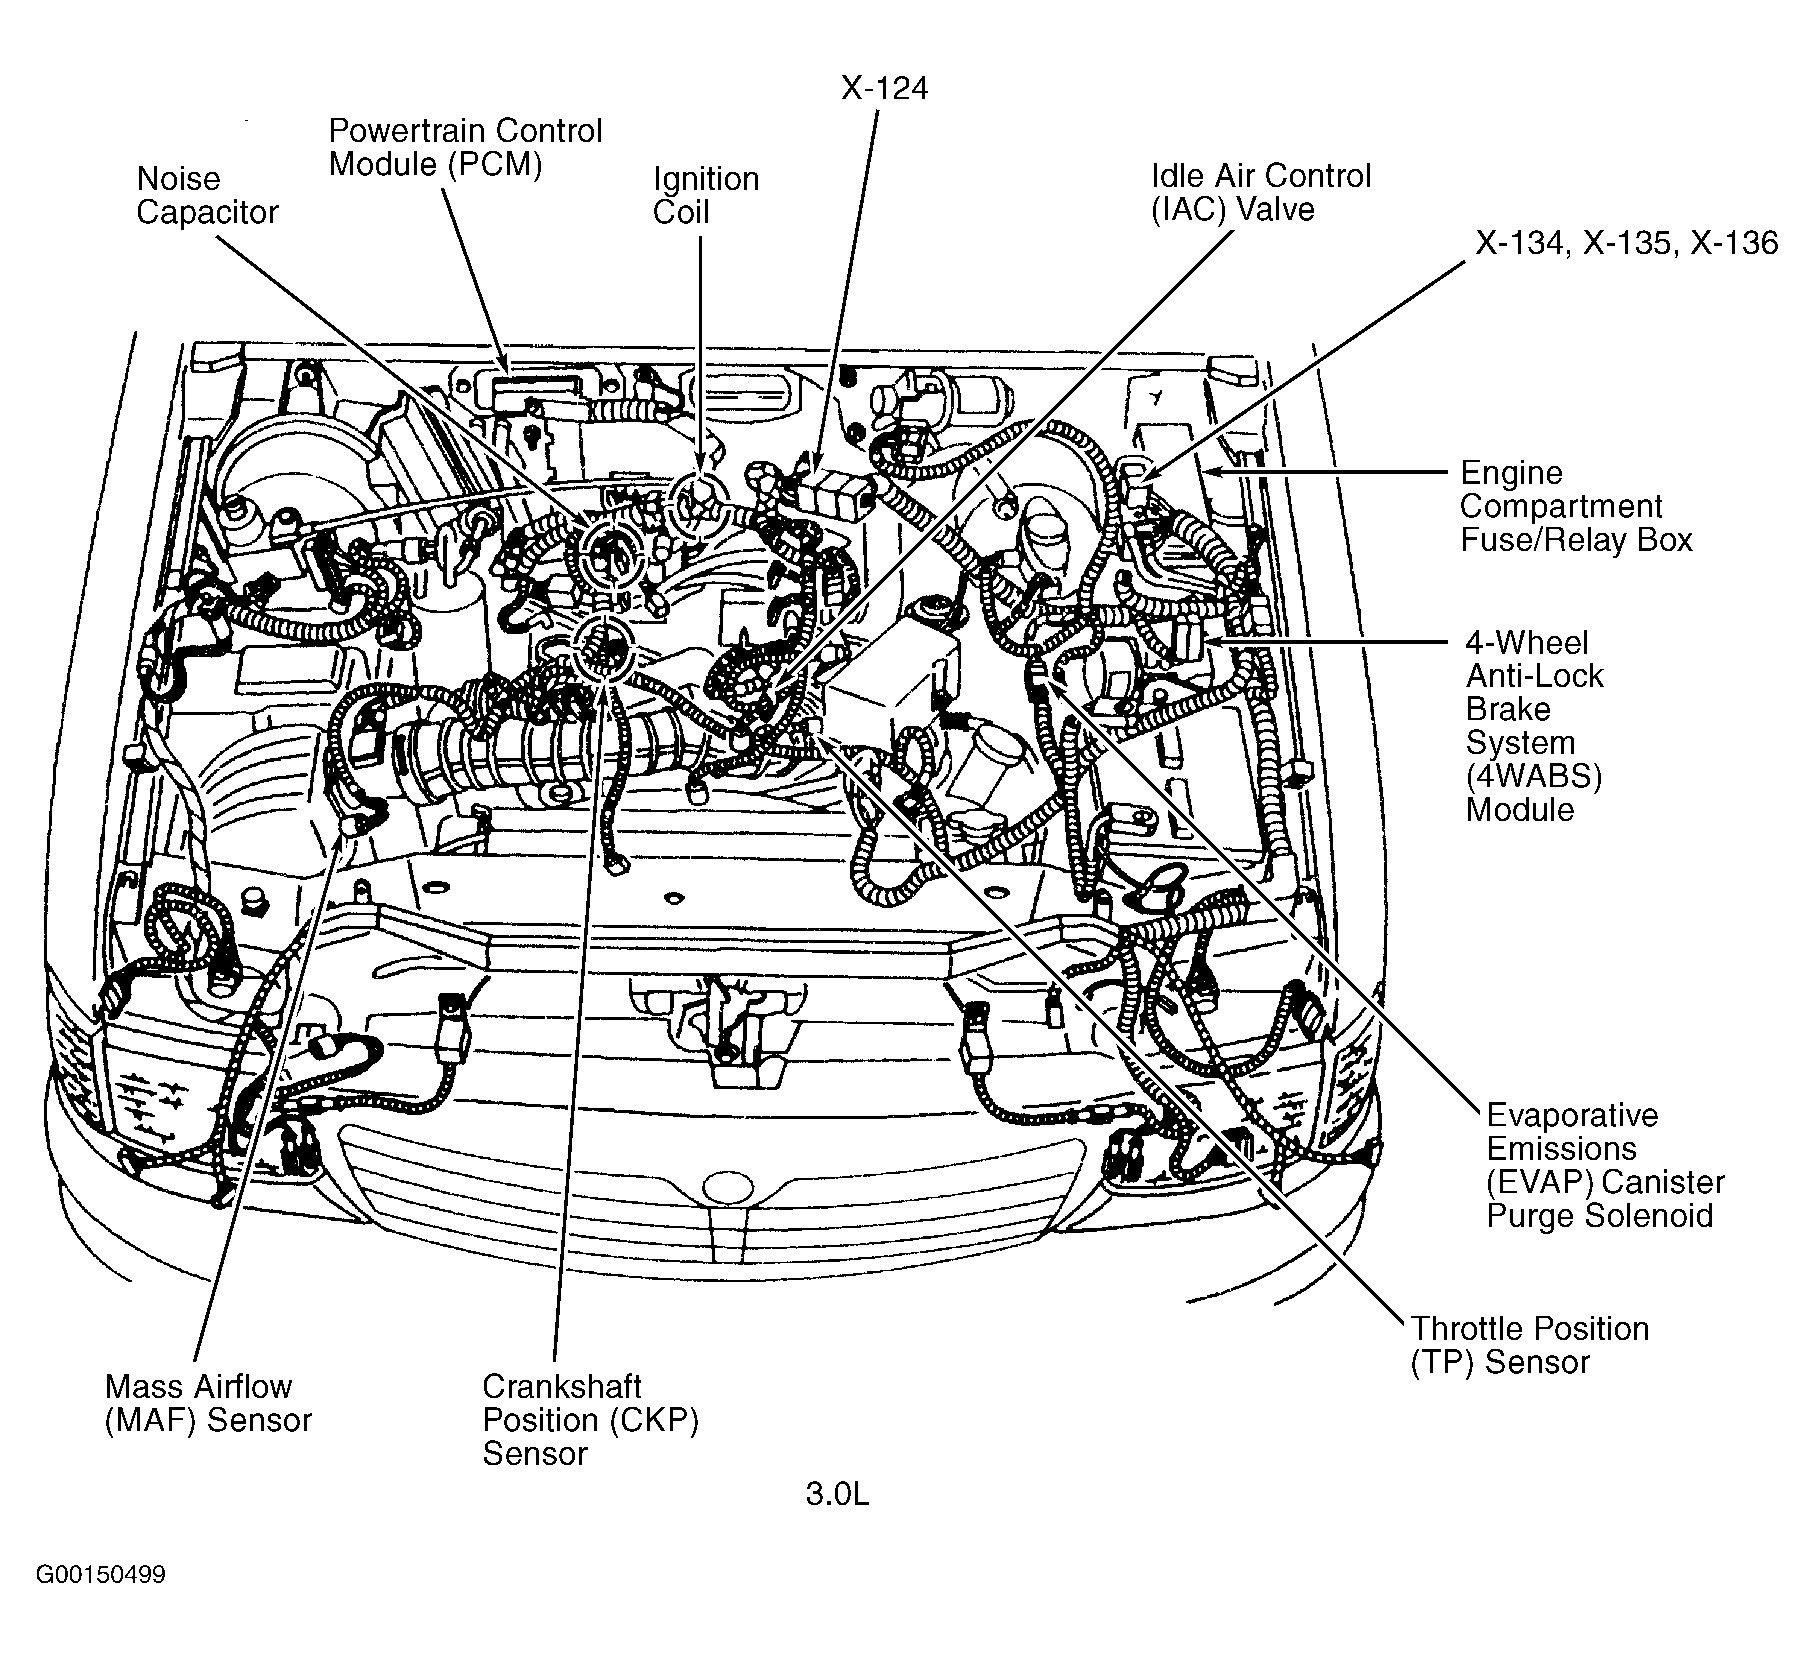 2008 Audi A4 Engine Compartment Wiring Diagram - wiring diagram  structure-directory - structure-directory.giorgiomariacalori.it | Audi B5 Engine Diagram |  | giorgiomariacalori.it